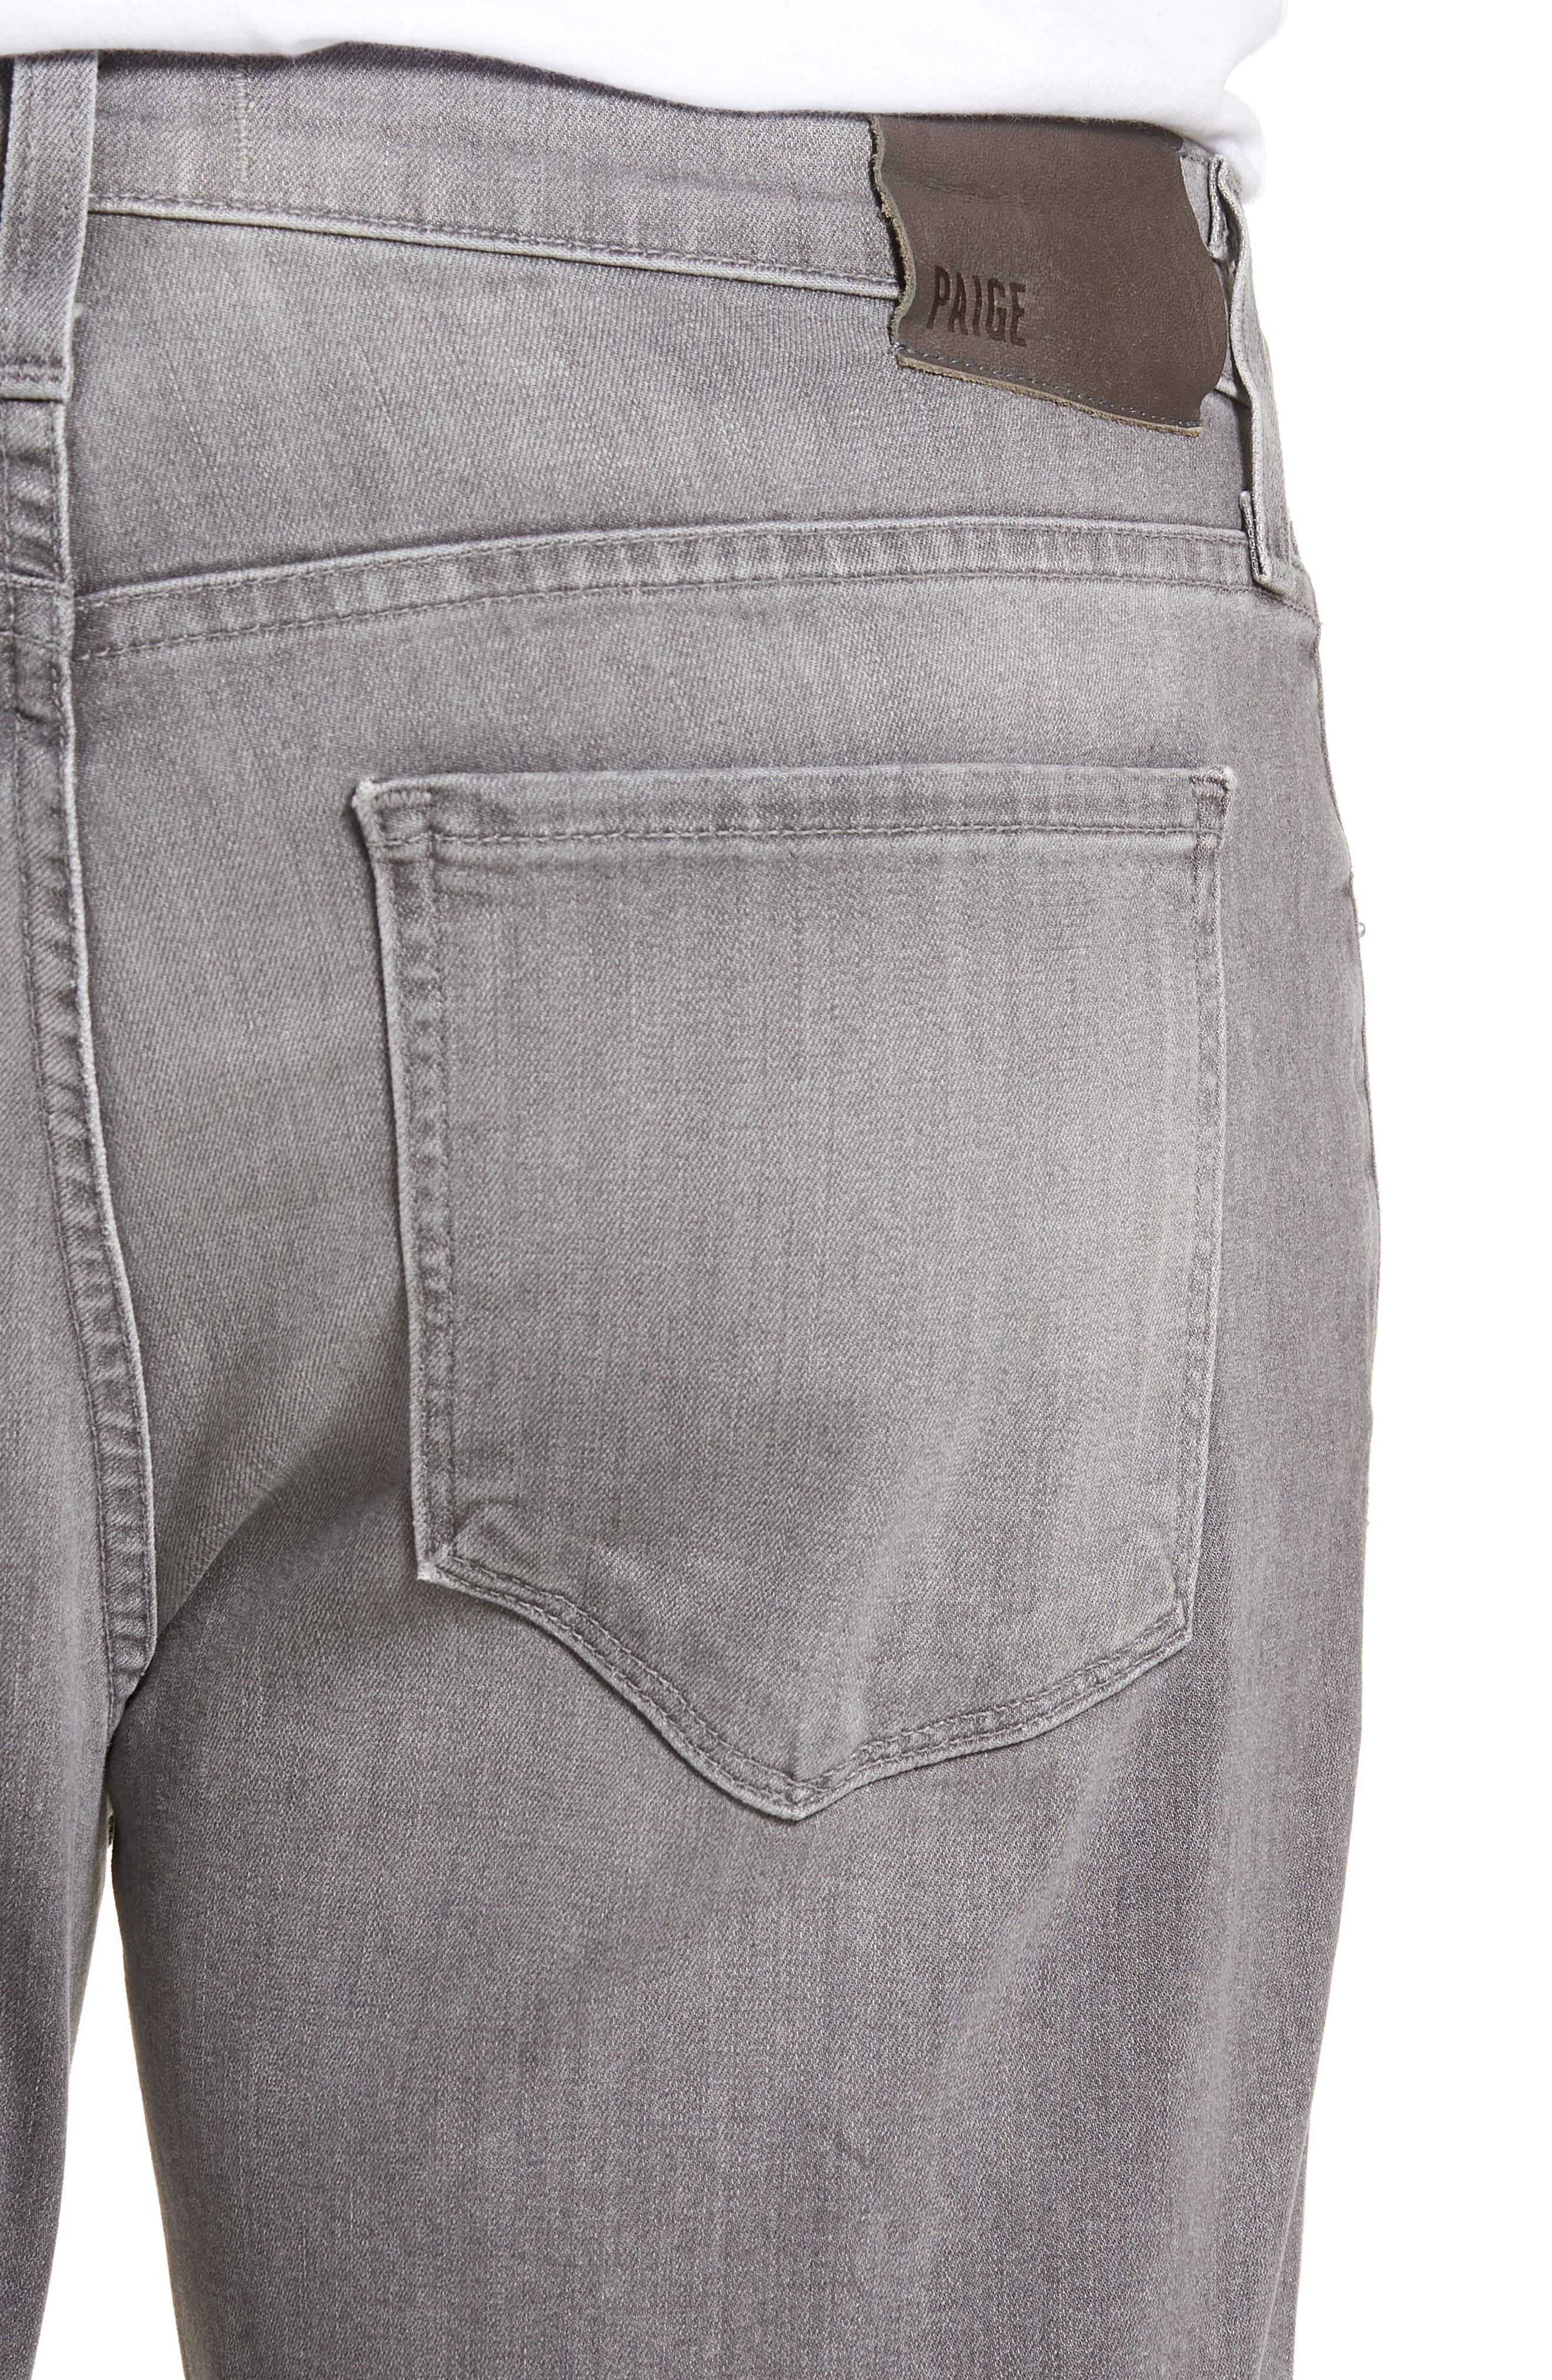 Normandie Straight Leg Jeans,                             Alternate thumbnail 4, color,                             030